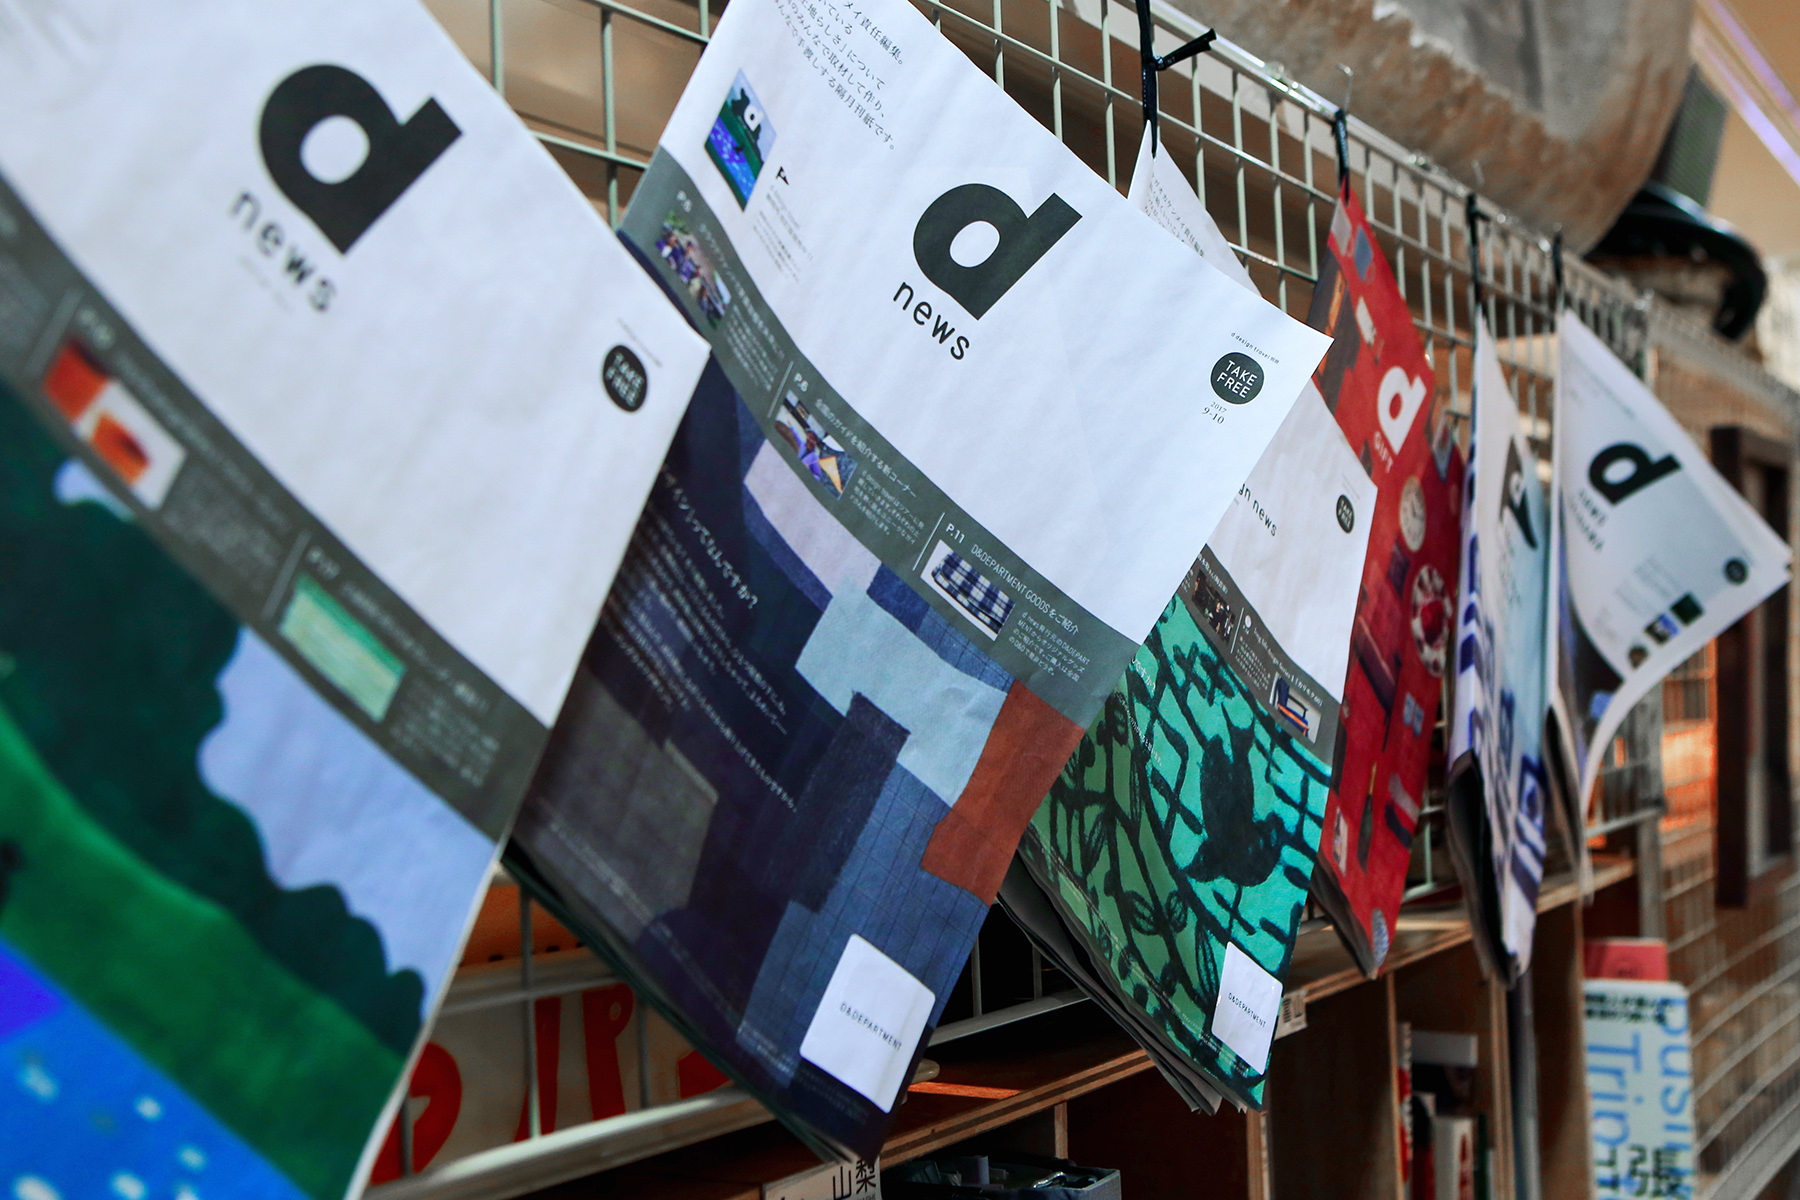 D&D在創立初期曾以「設計」為切面,發行雜誌《d long life design》。2009年改以旅遊為主題,發行《d design travel》。